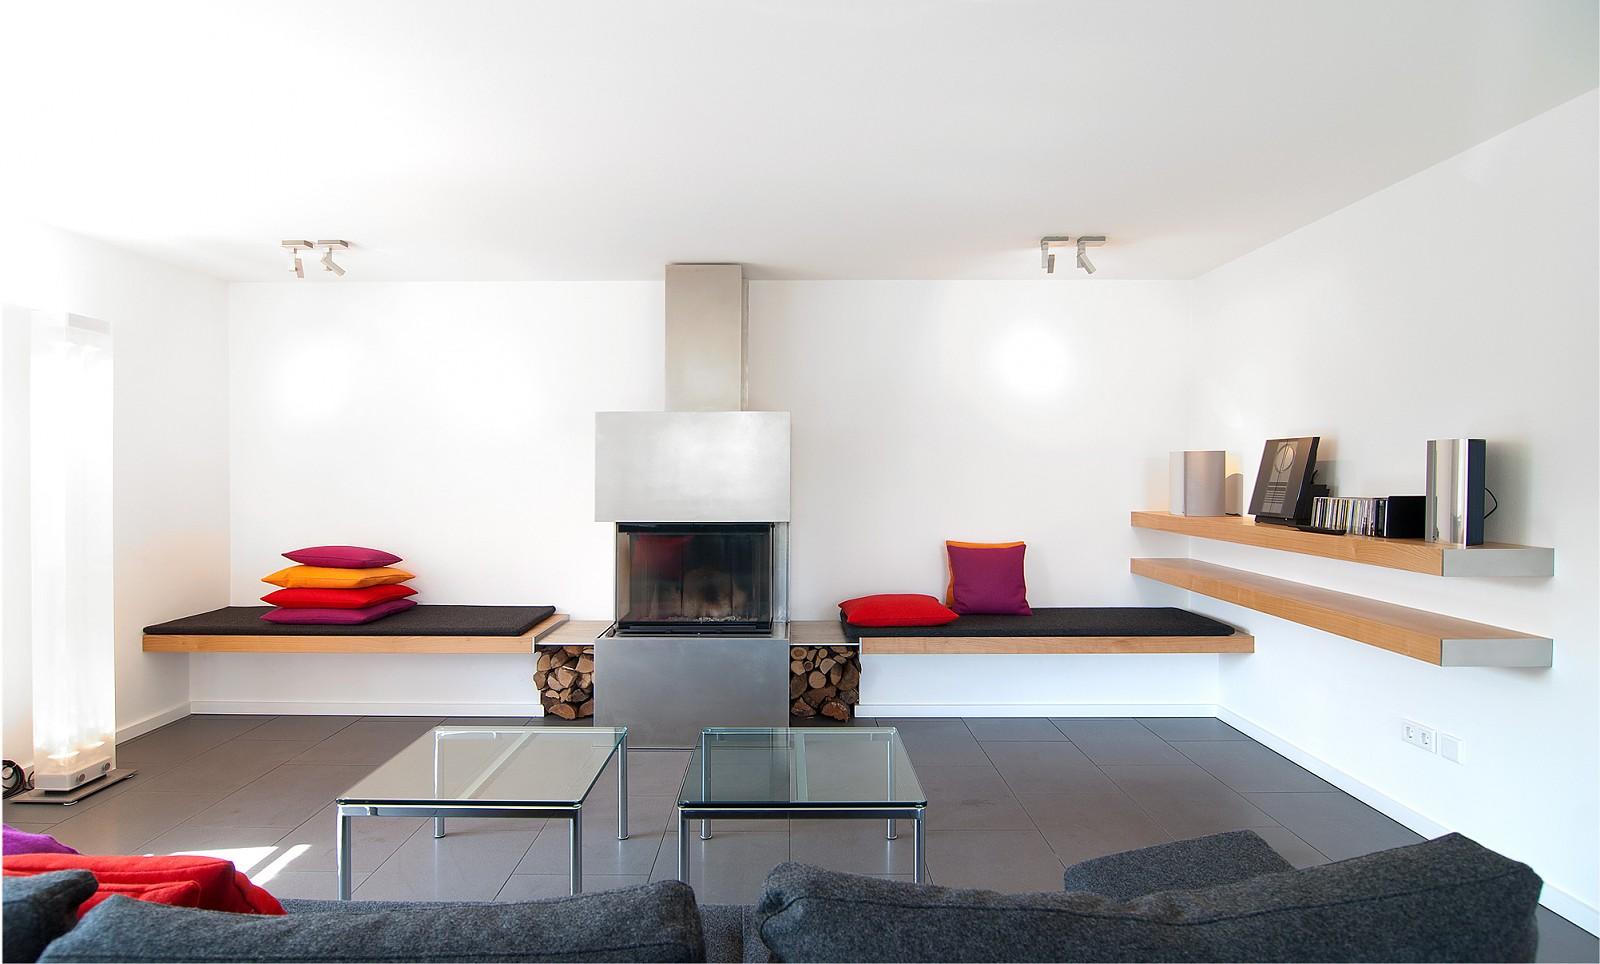 tischlerei sommer am meer tischlerei sommer am meer. Black Bedroom Furniture Sets. Home Design Ideas